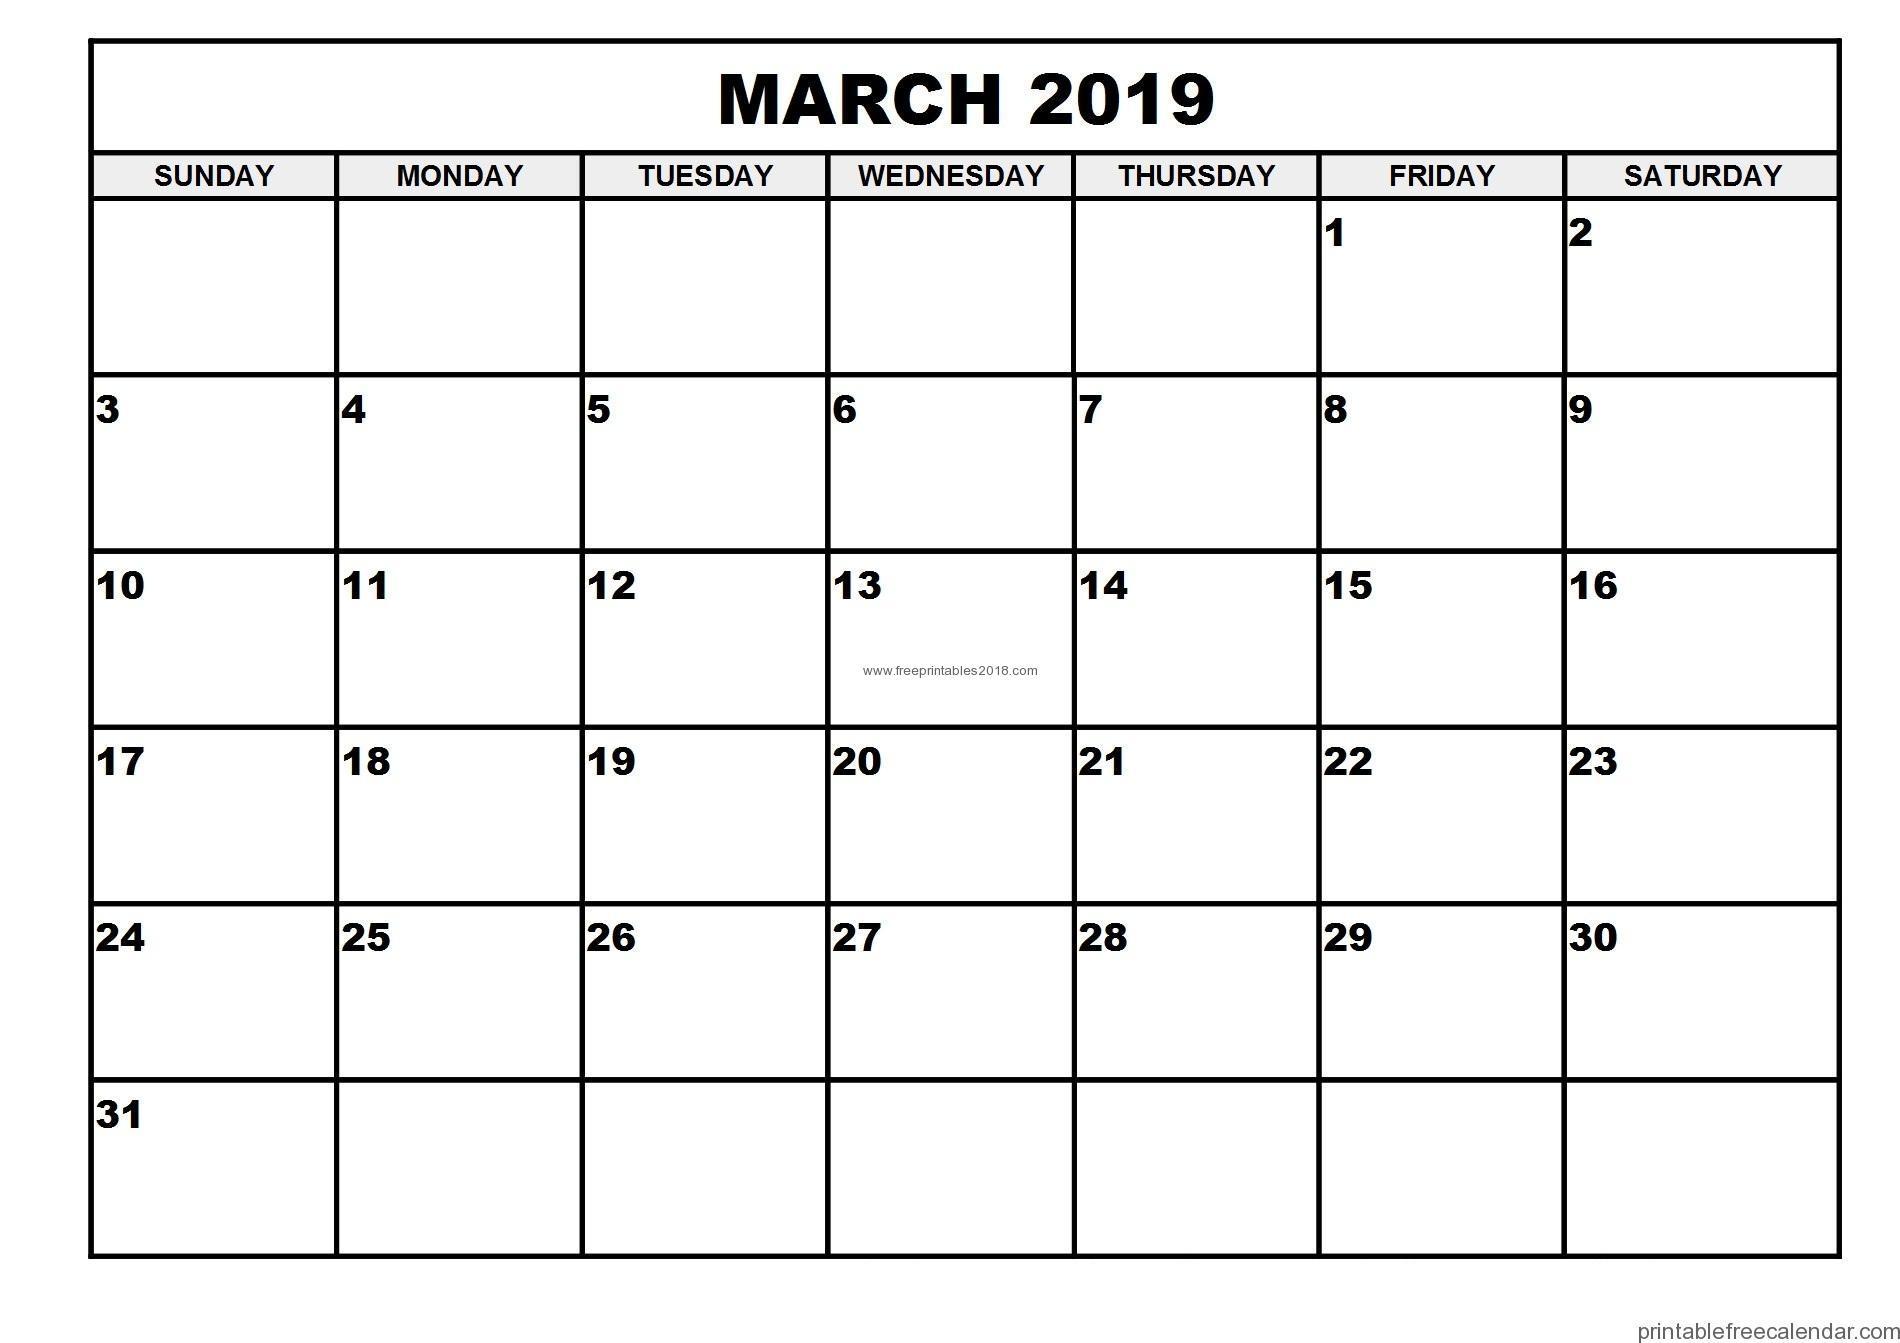 Free Printable March 2019 Calendar Templates   Free Printables 2019 intended for Calendar Printable Free Template